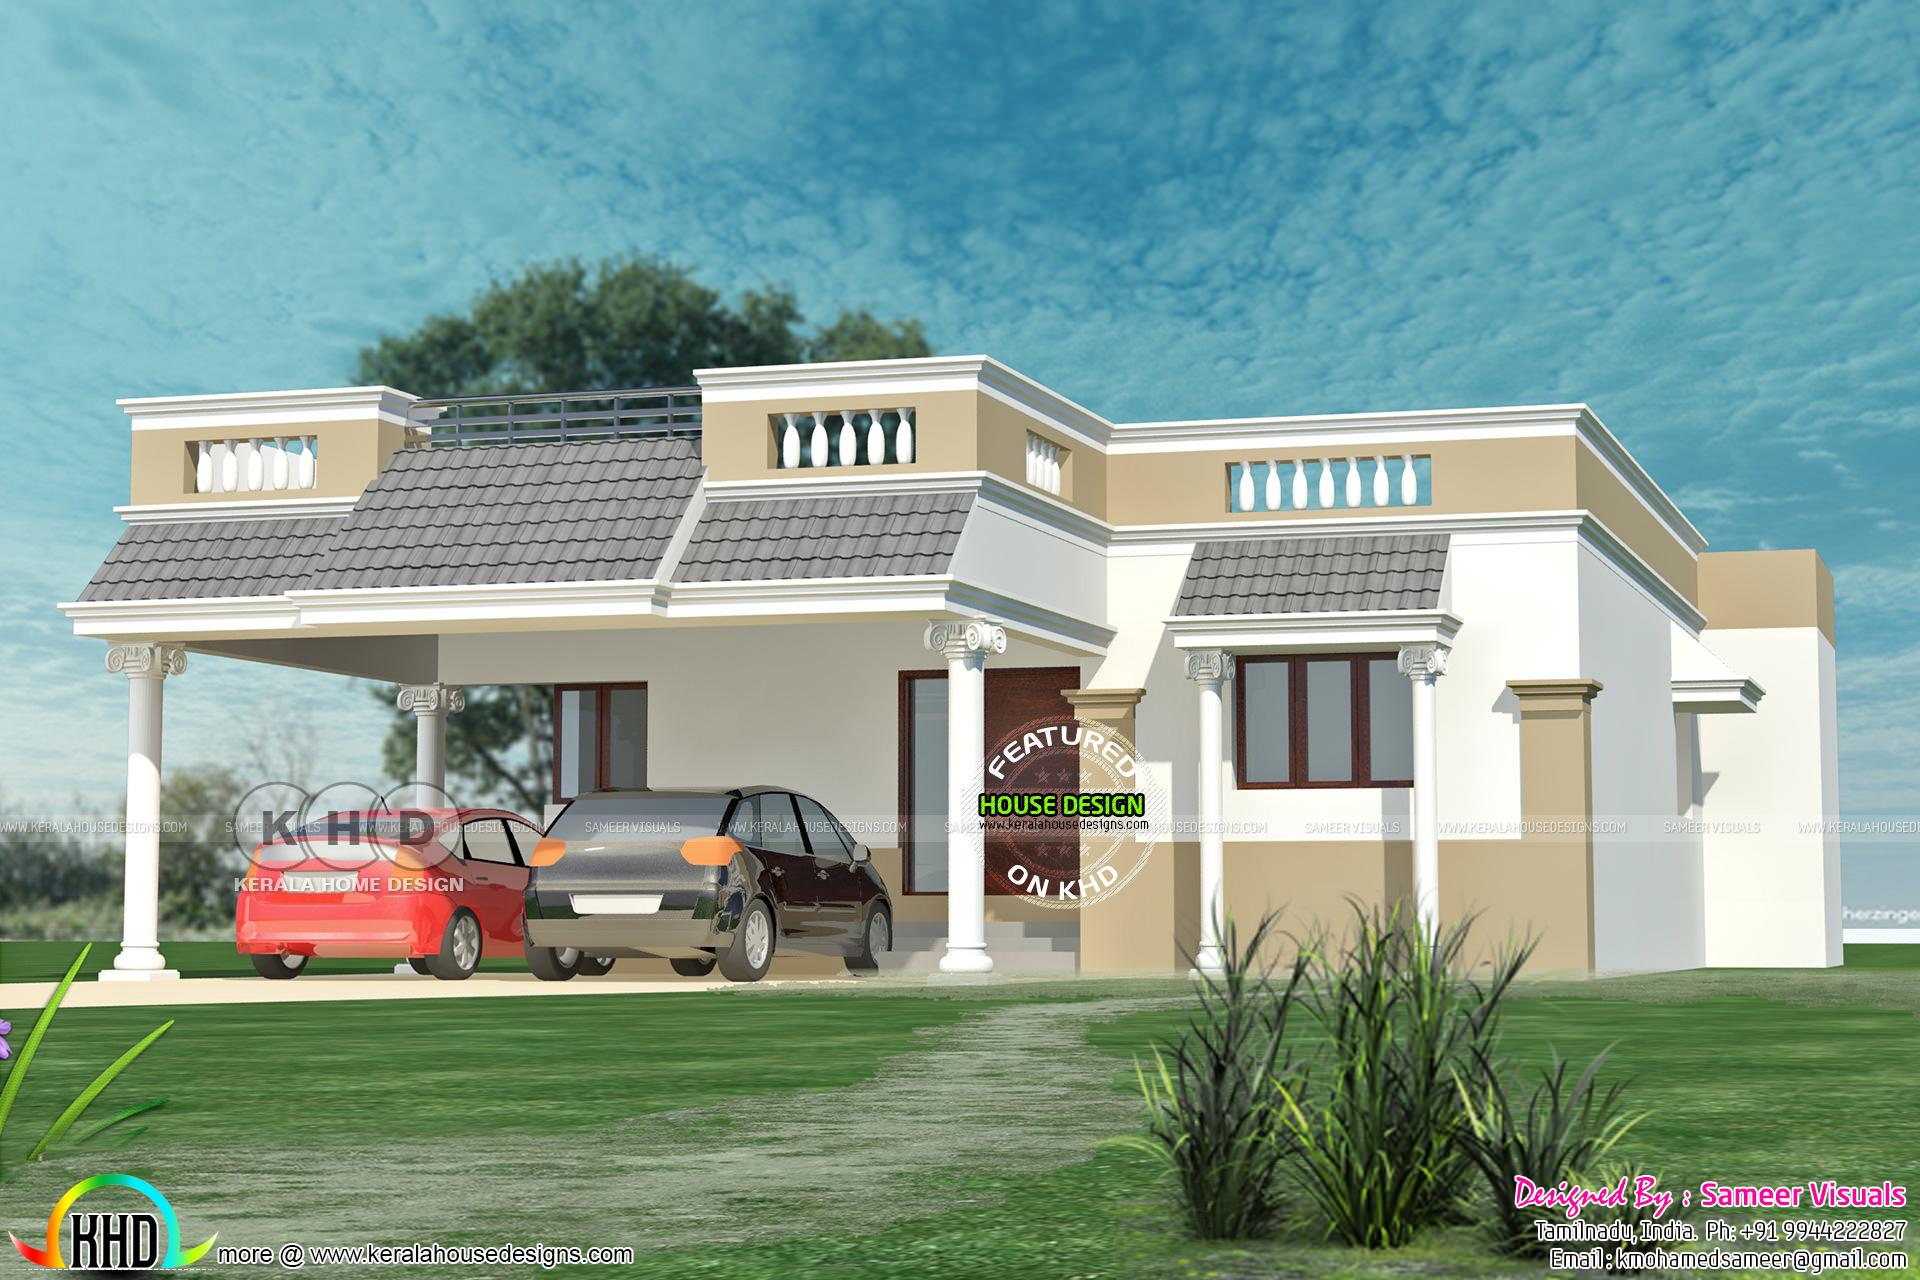 Tamilnadu Style 3 Bedroom Single Floor Home 1380 Sq Ft Kerala Home Design And Floor Plans 8000 Houses